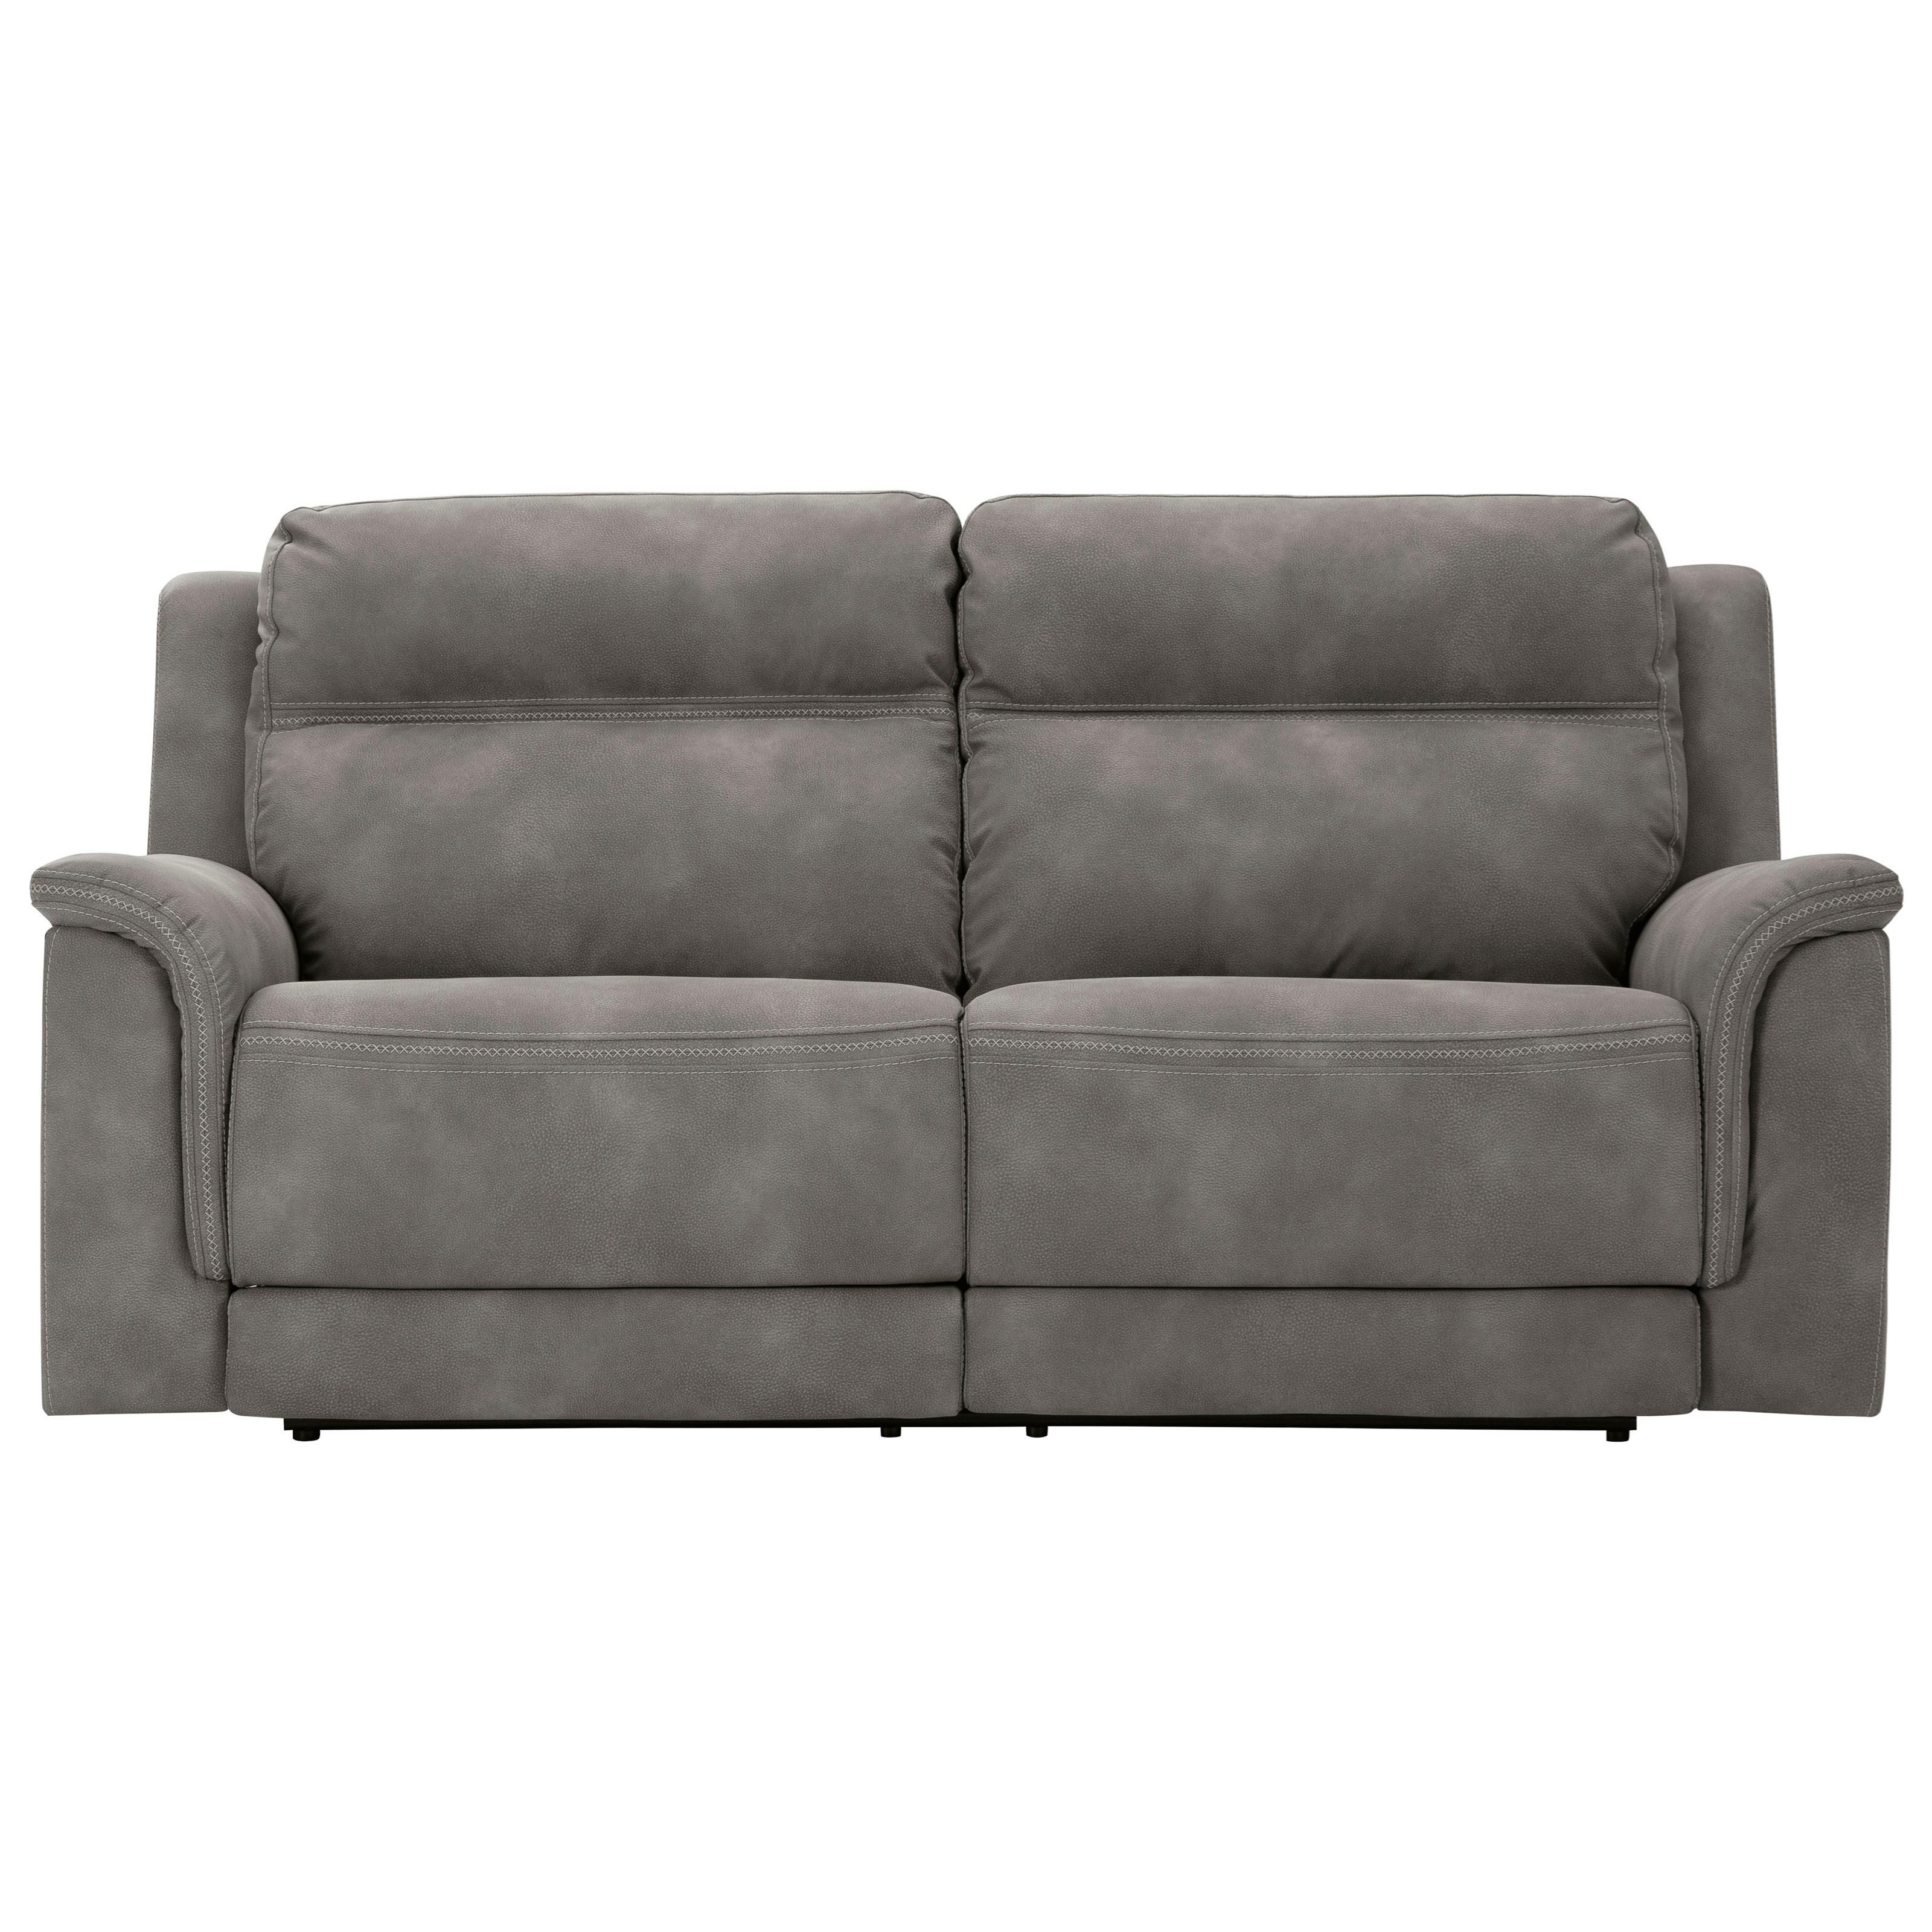 Next-Gen DuraPella 2-Seat Pwr Rec Sofa  w/ Adj Headrests by Signature Design by Ashley at Standard Furniture